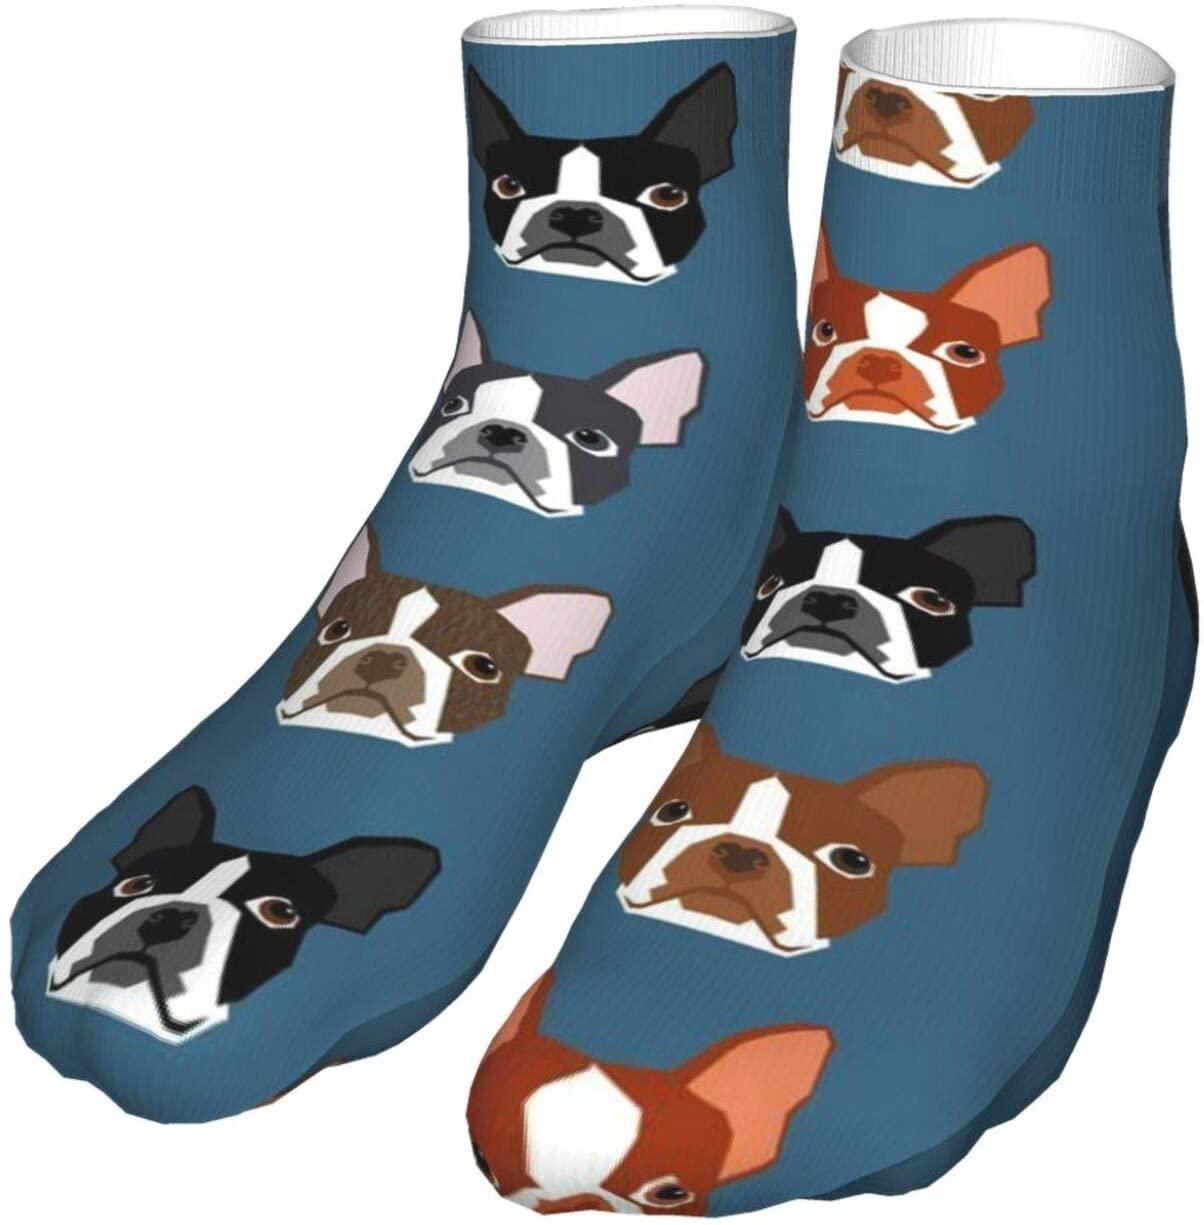 antcreptson Boston Terriers Blue Faces Compression Socks for Women & Men 40mmhg-Pvendor Athletic Nursing Stocking for Running, Flight, Travel, Nurses, Edema Stockings Nursing